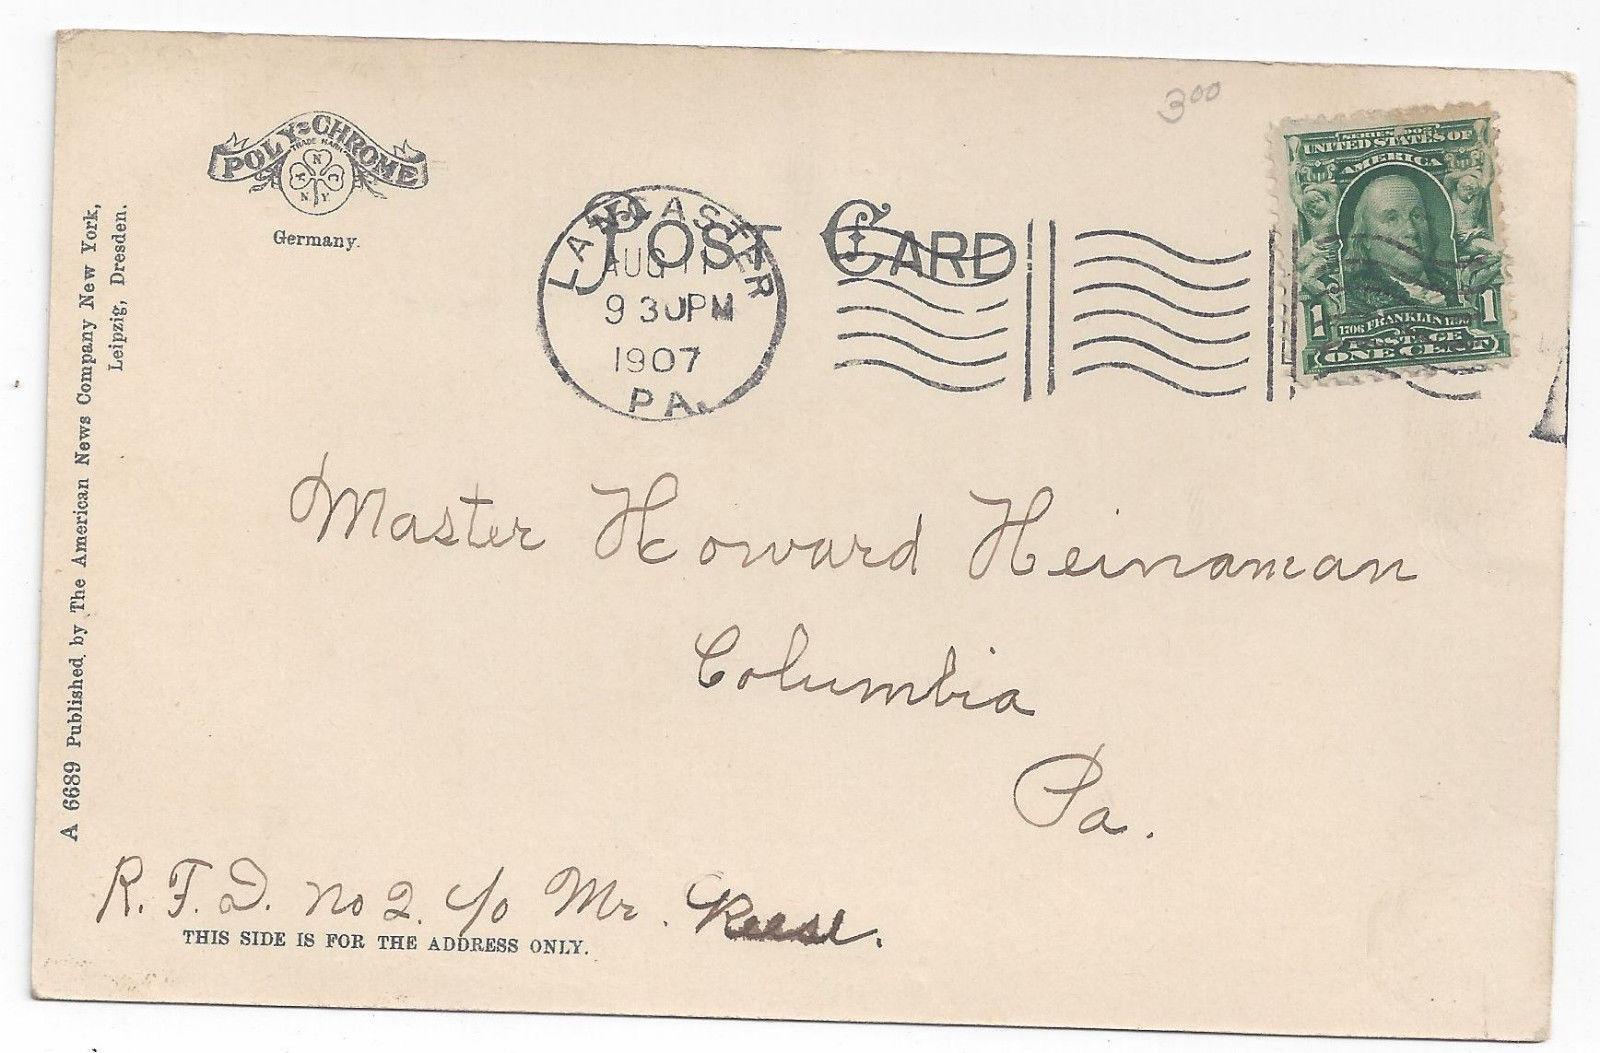 Lancaster PA General Hospital 1907 American News Co Vintage UND Postcard